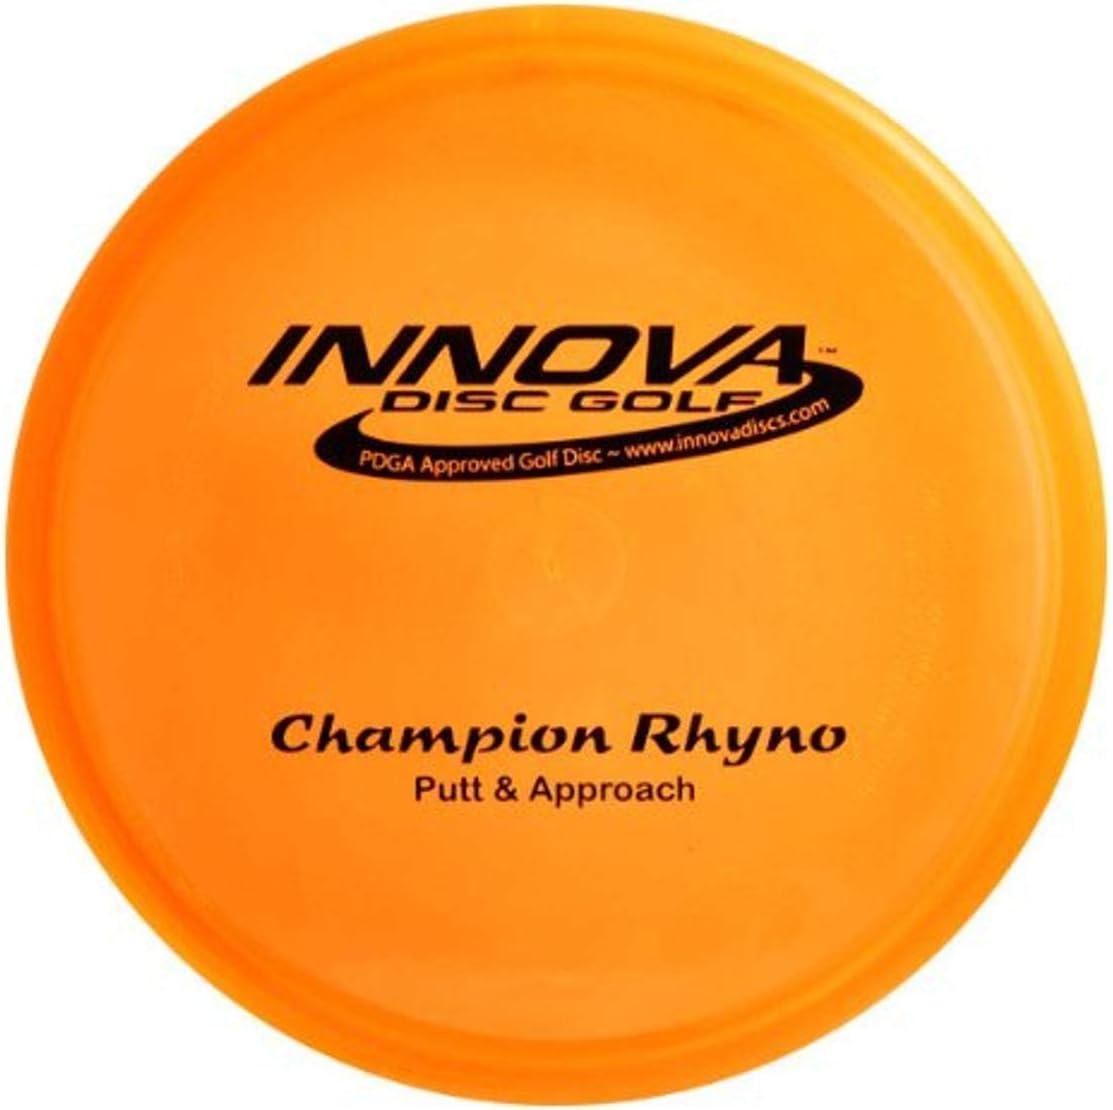 Innova Disc Golf Champion Material Rhyno Golf Disc